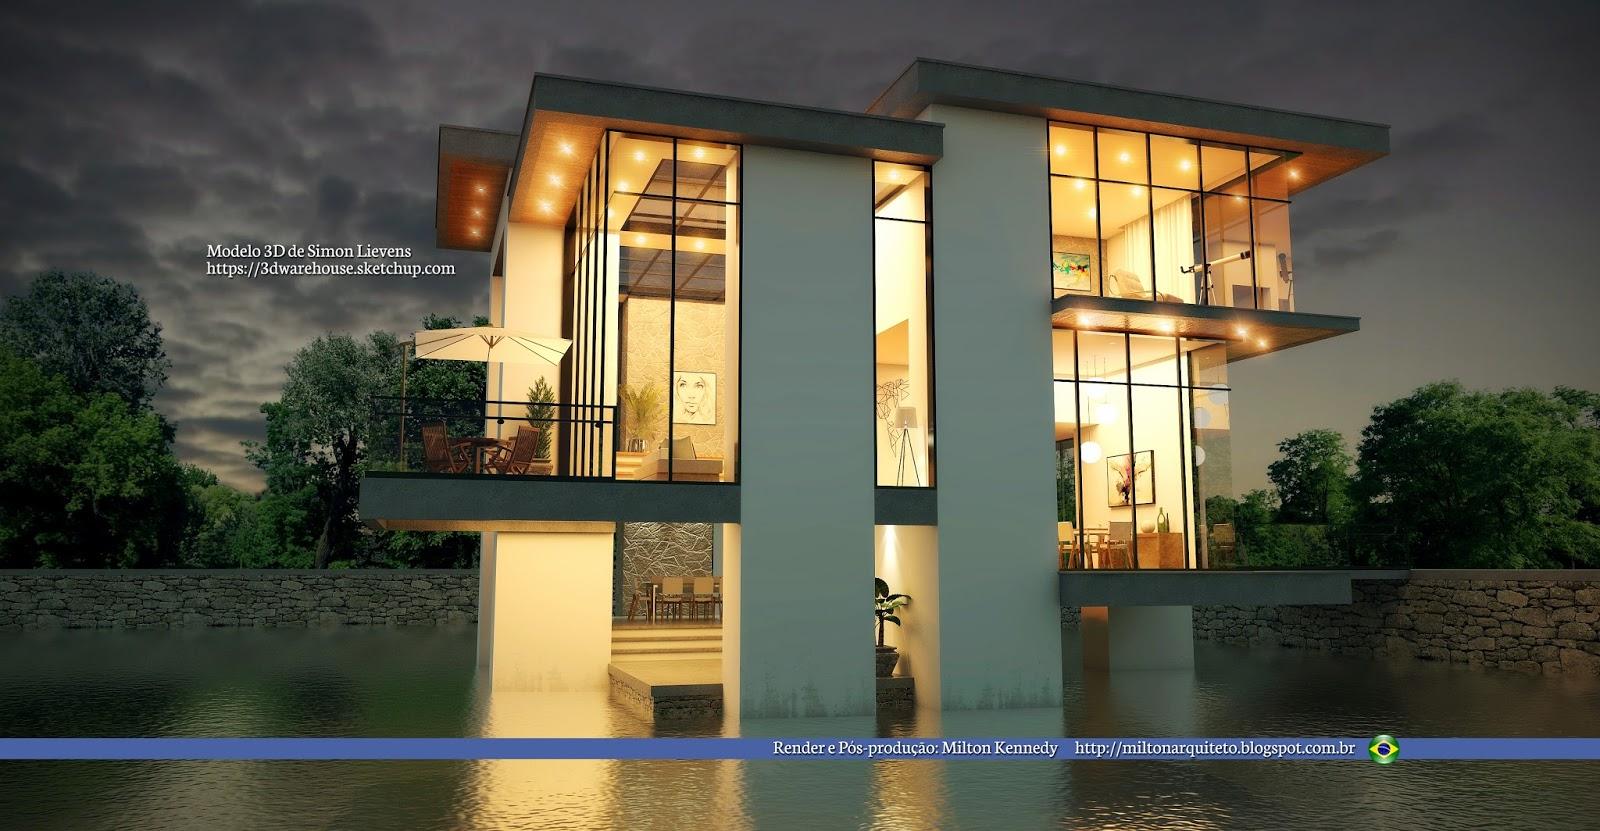 Milton kennedy arquiteto for Casa moderna sketchup download